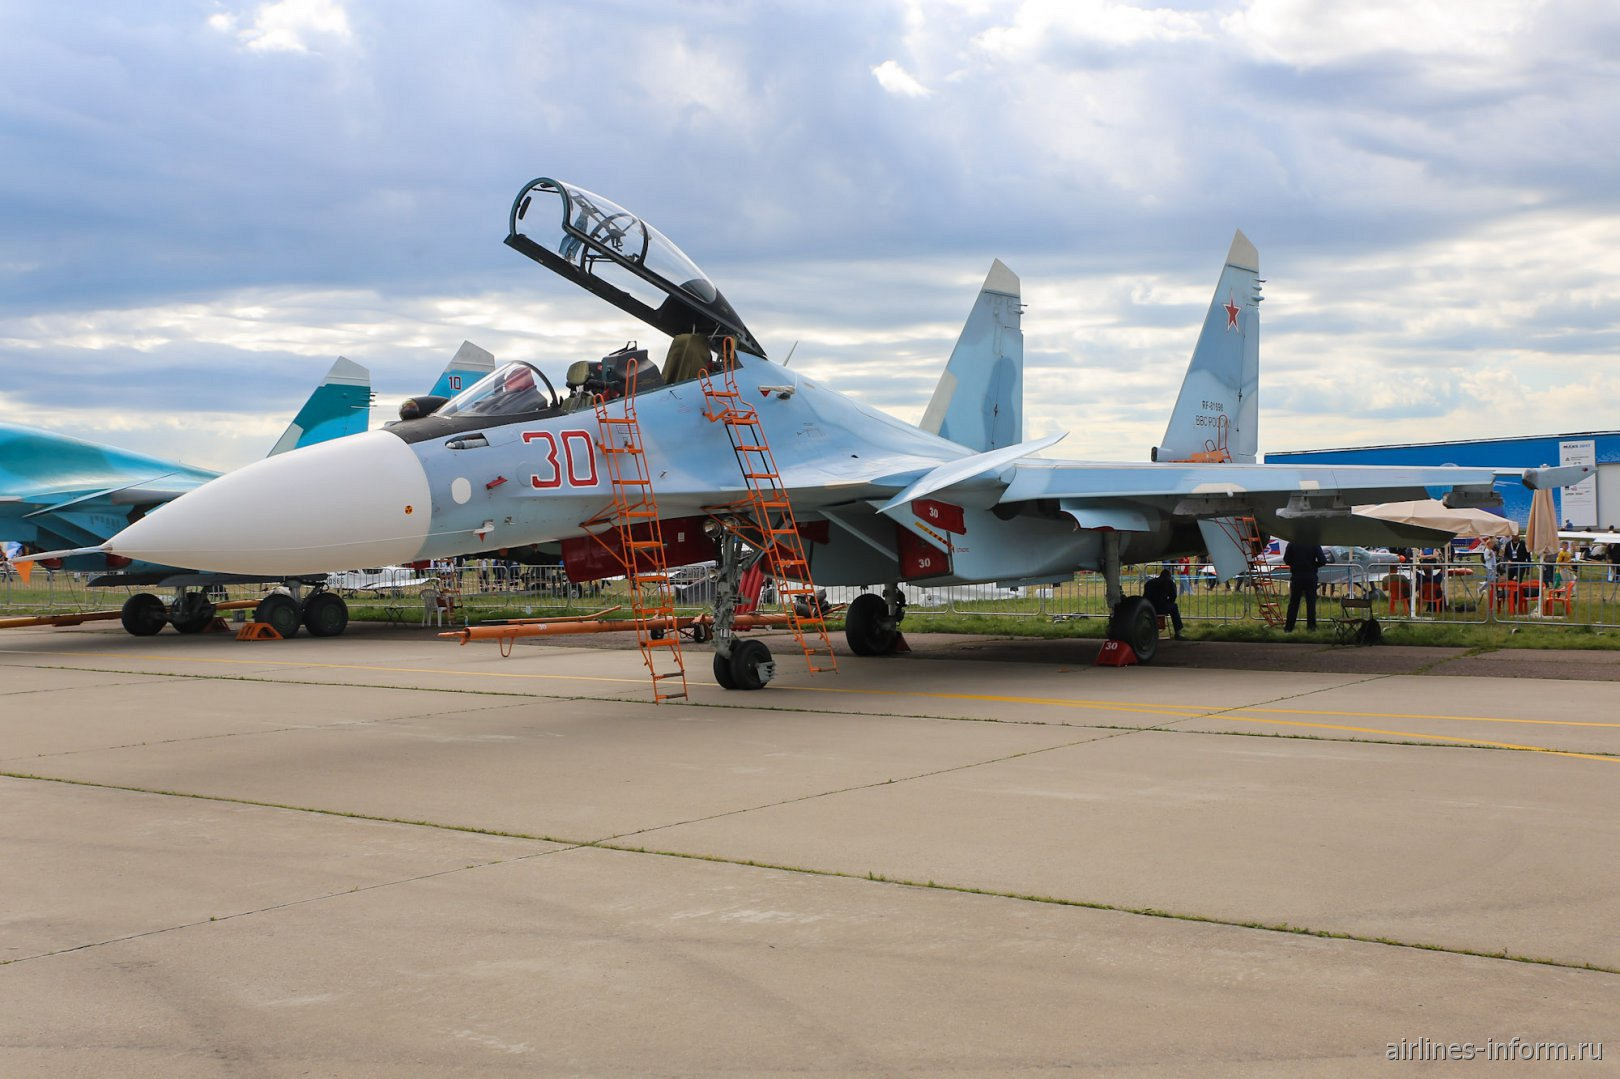 Истребитель Су-30СМ на авиасалоне МАКС-2017